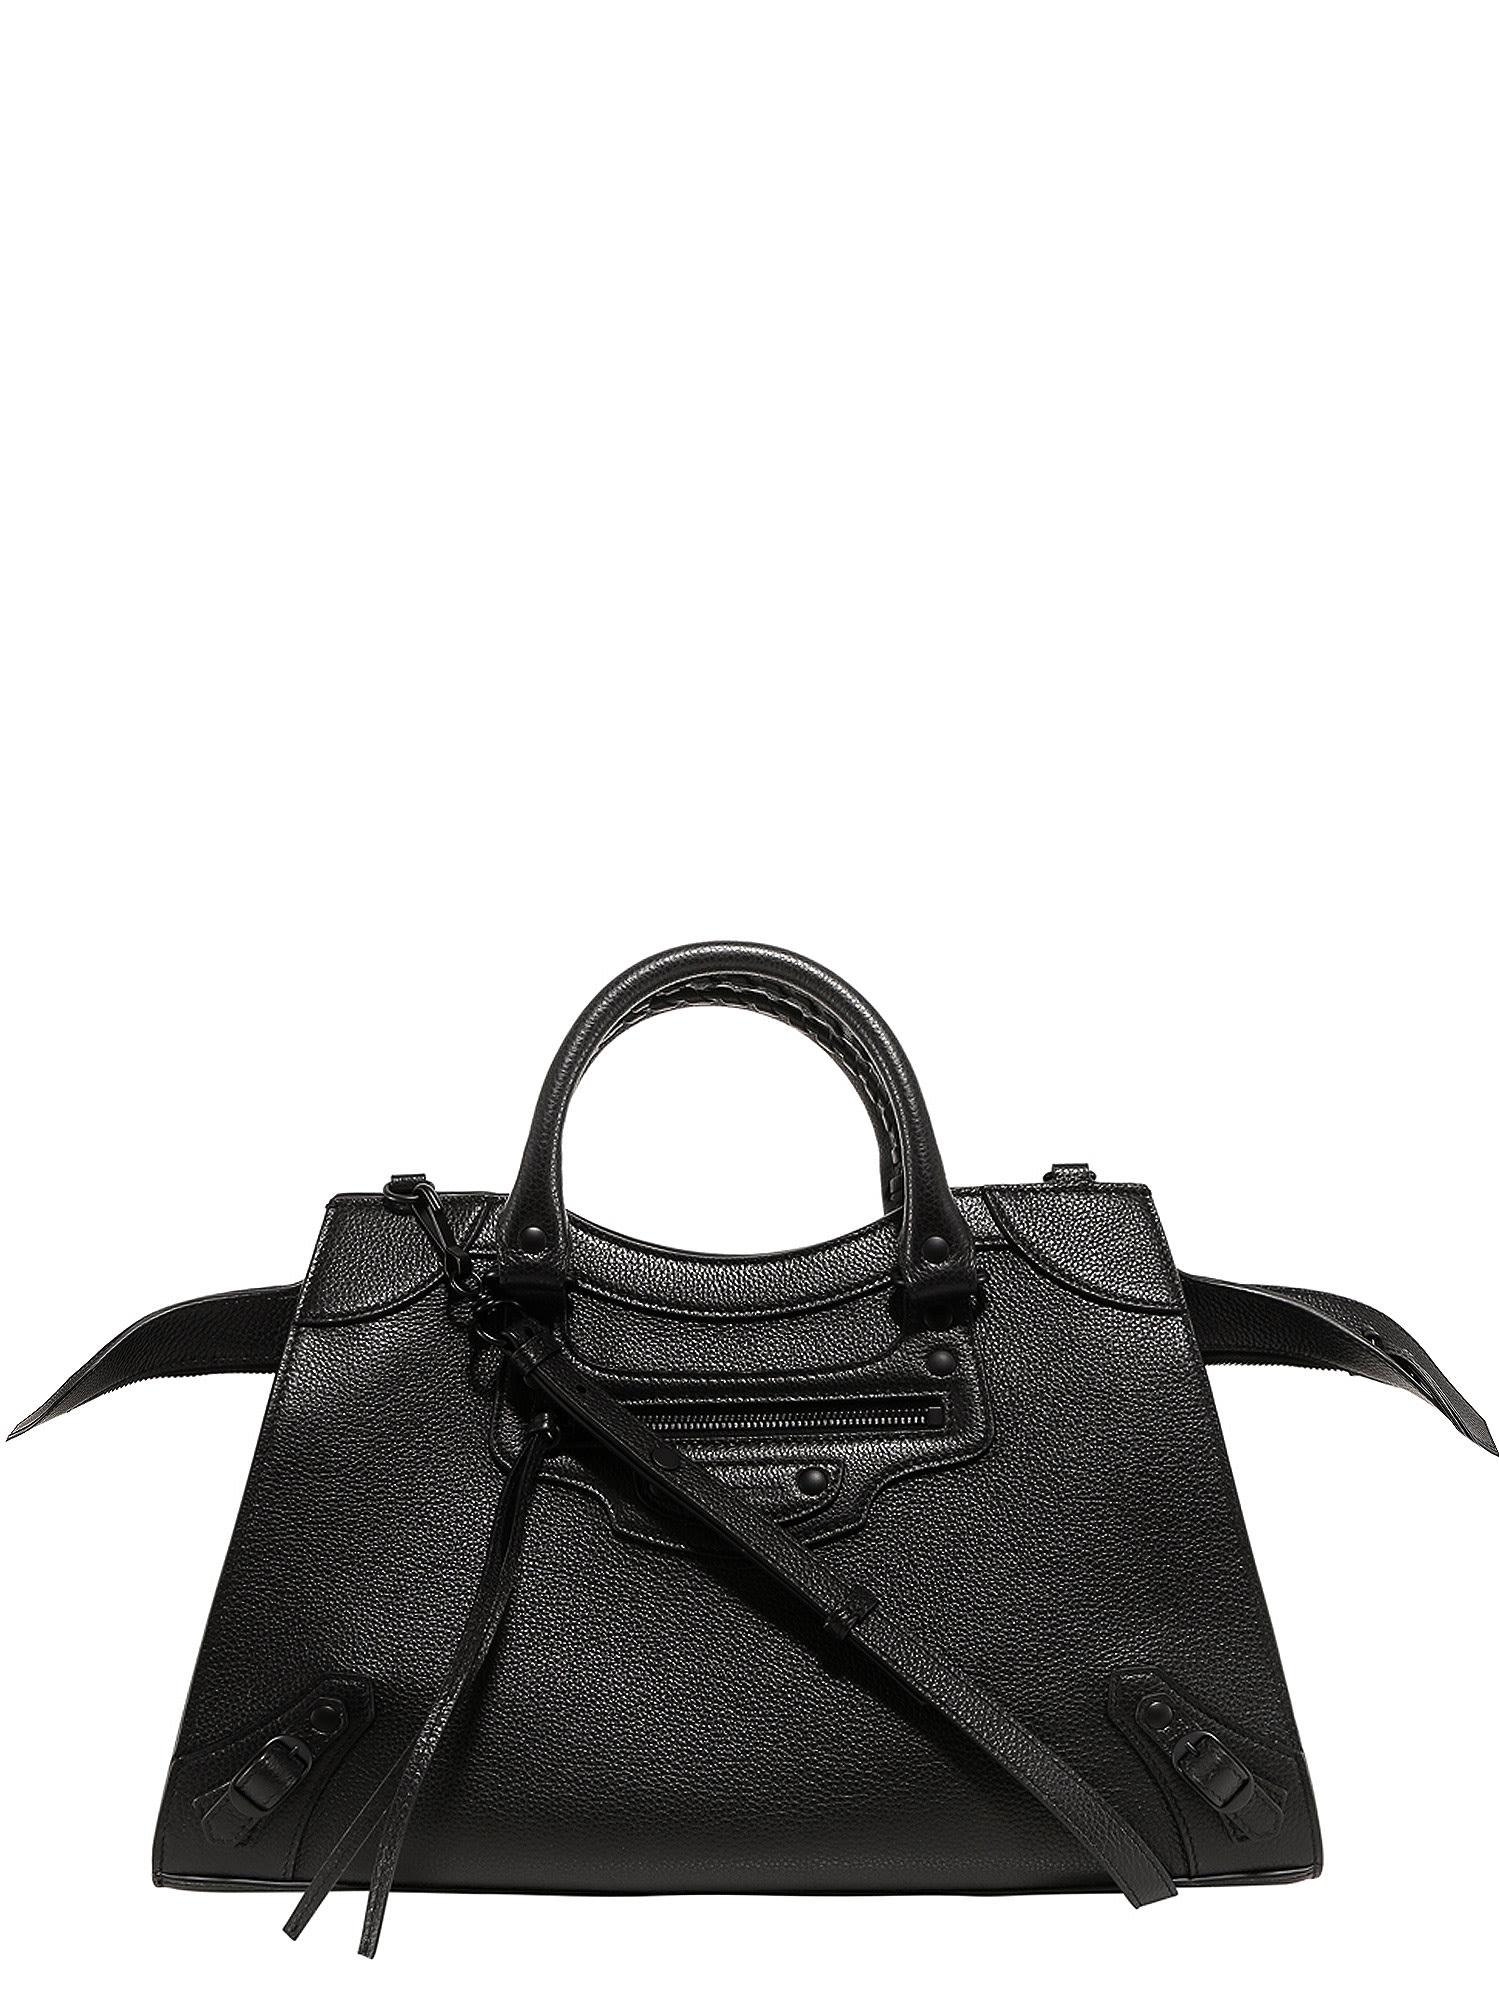 Balenciaga Leathers NEO CLASSIC HANDBAG